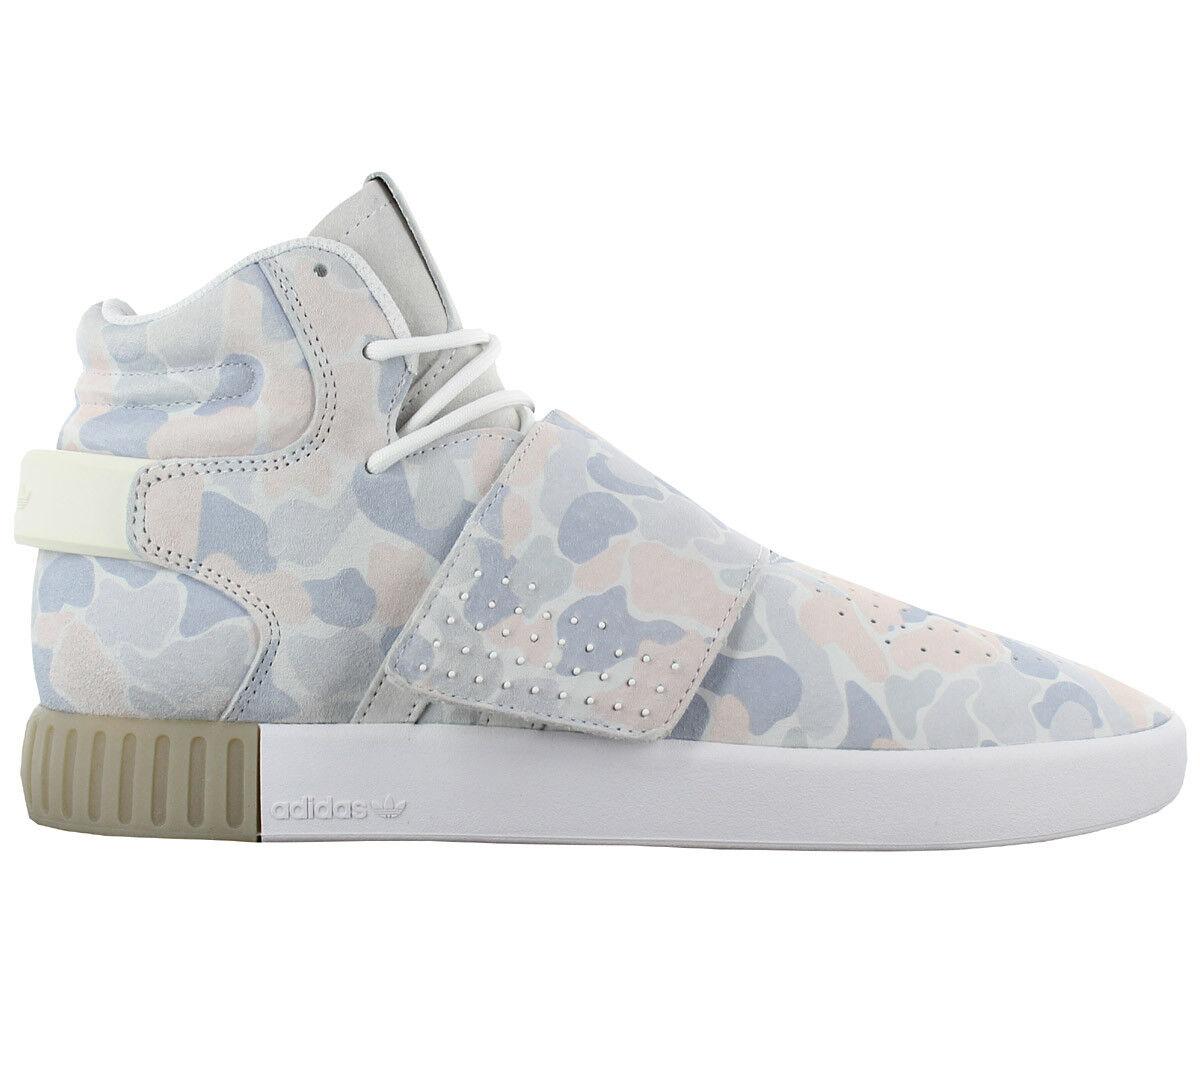 Adidas Baskets Camo Camouflage Invader Chaussures Tubular Originals BqpUBc6